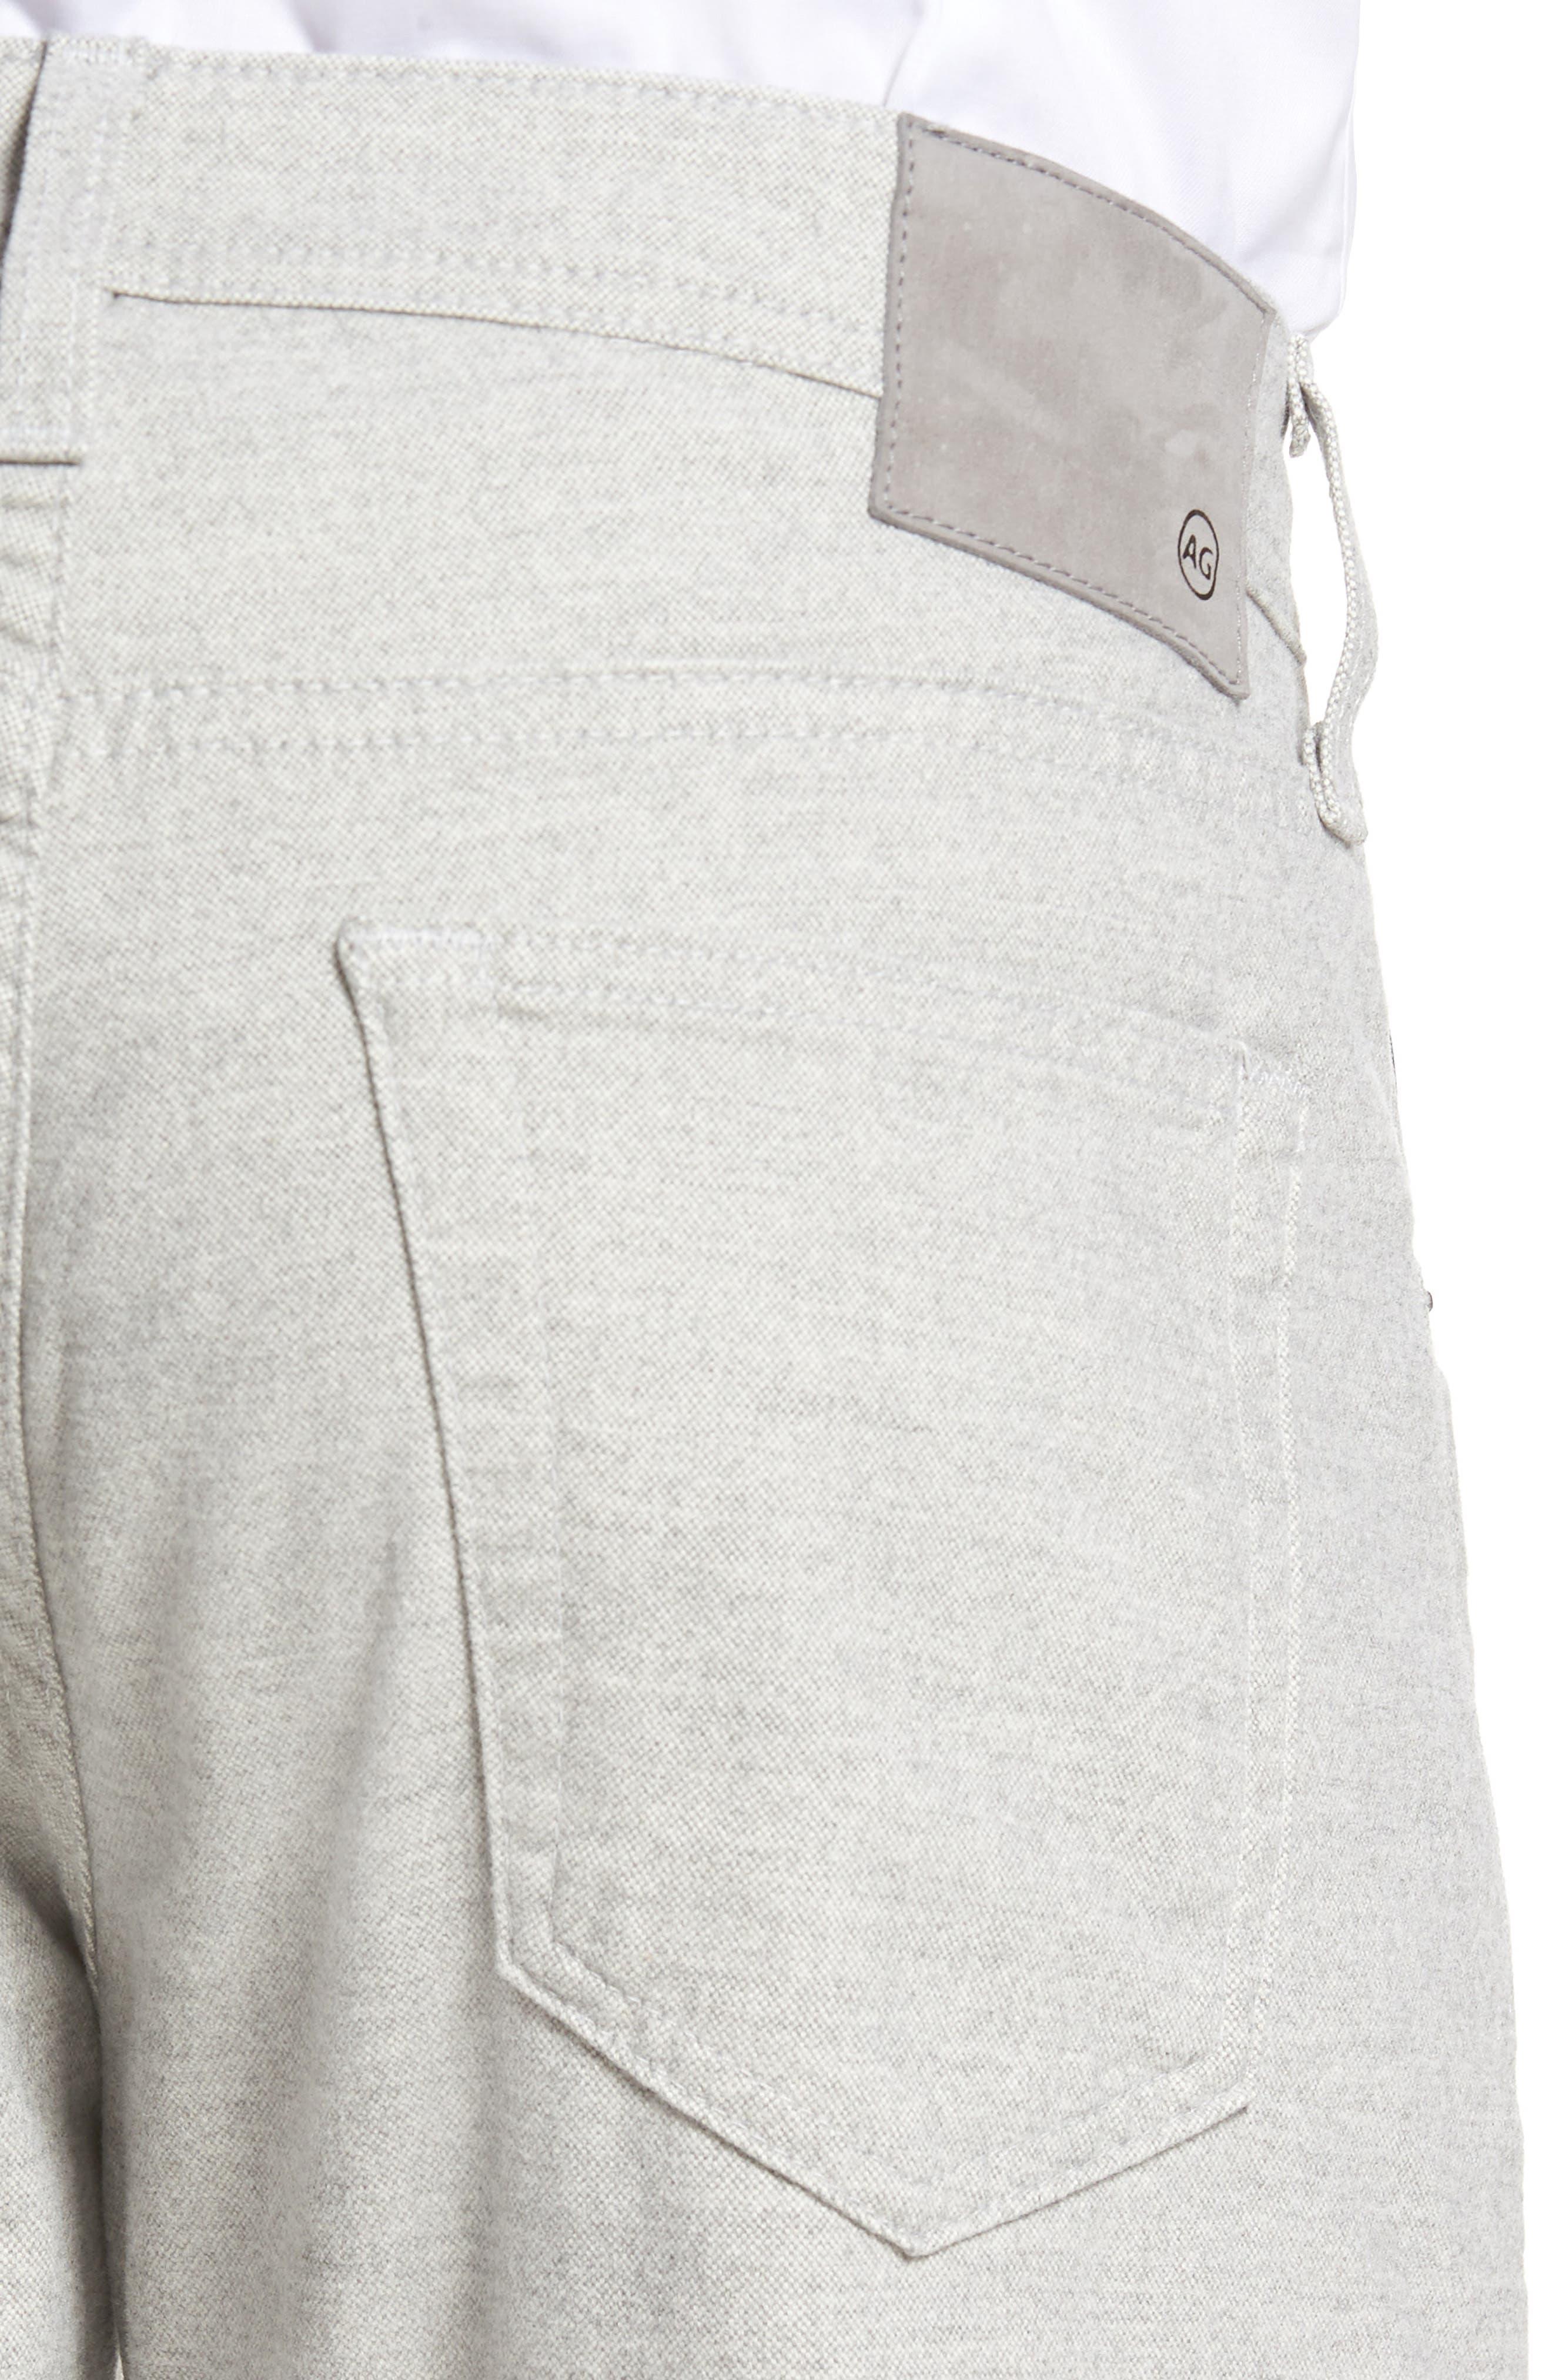 Graduate Tailored Five-Pocket Straight Leg Pants,                             Alternate thumbnail 4, color,                             020